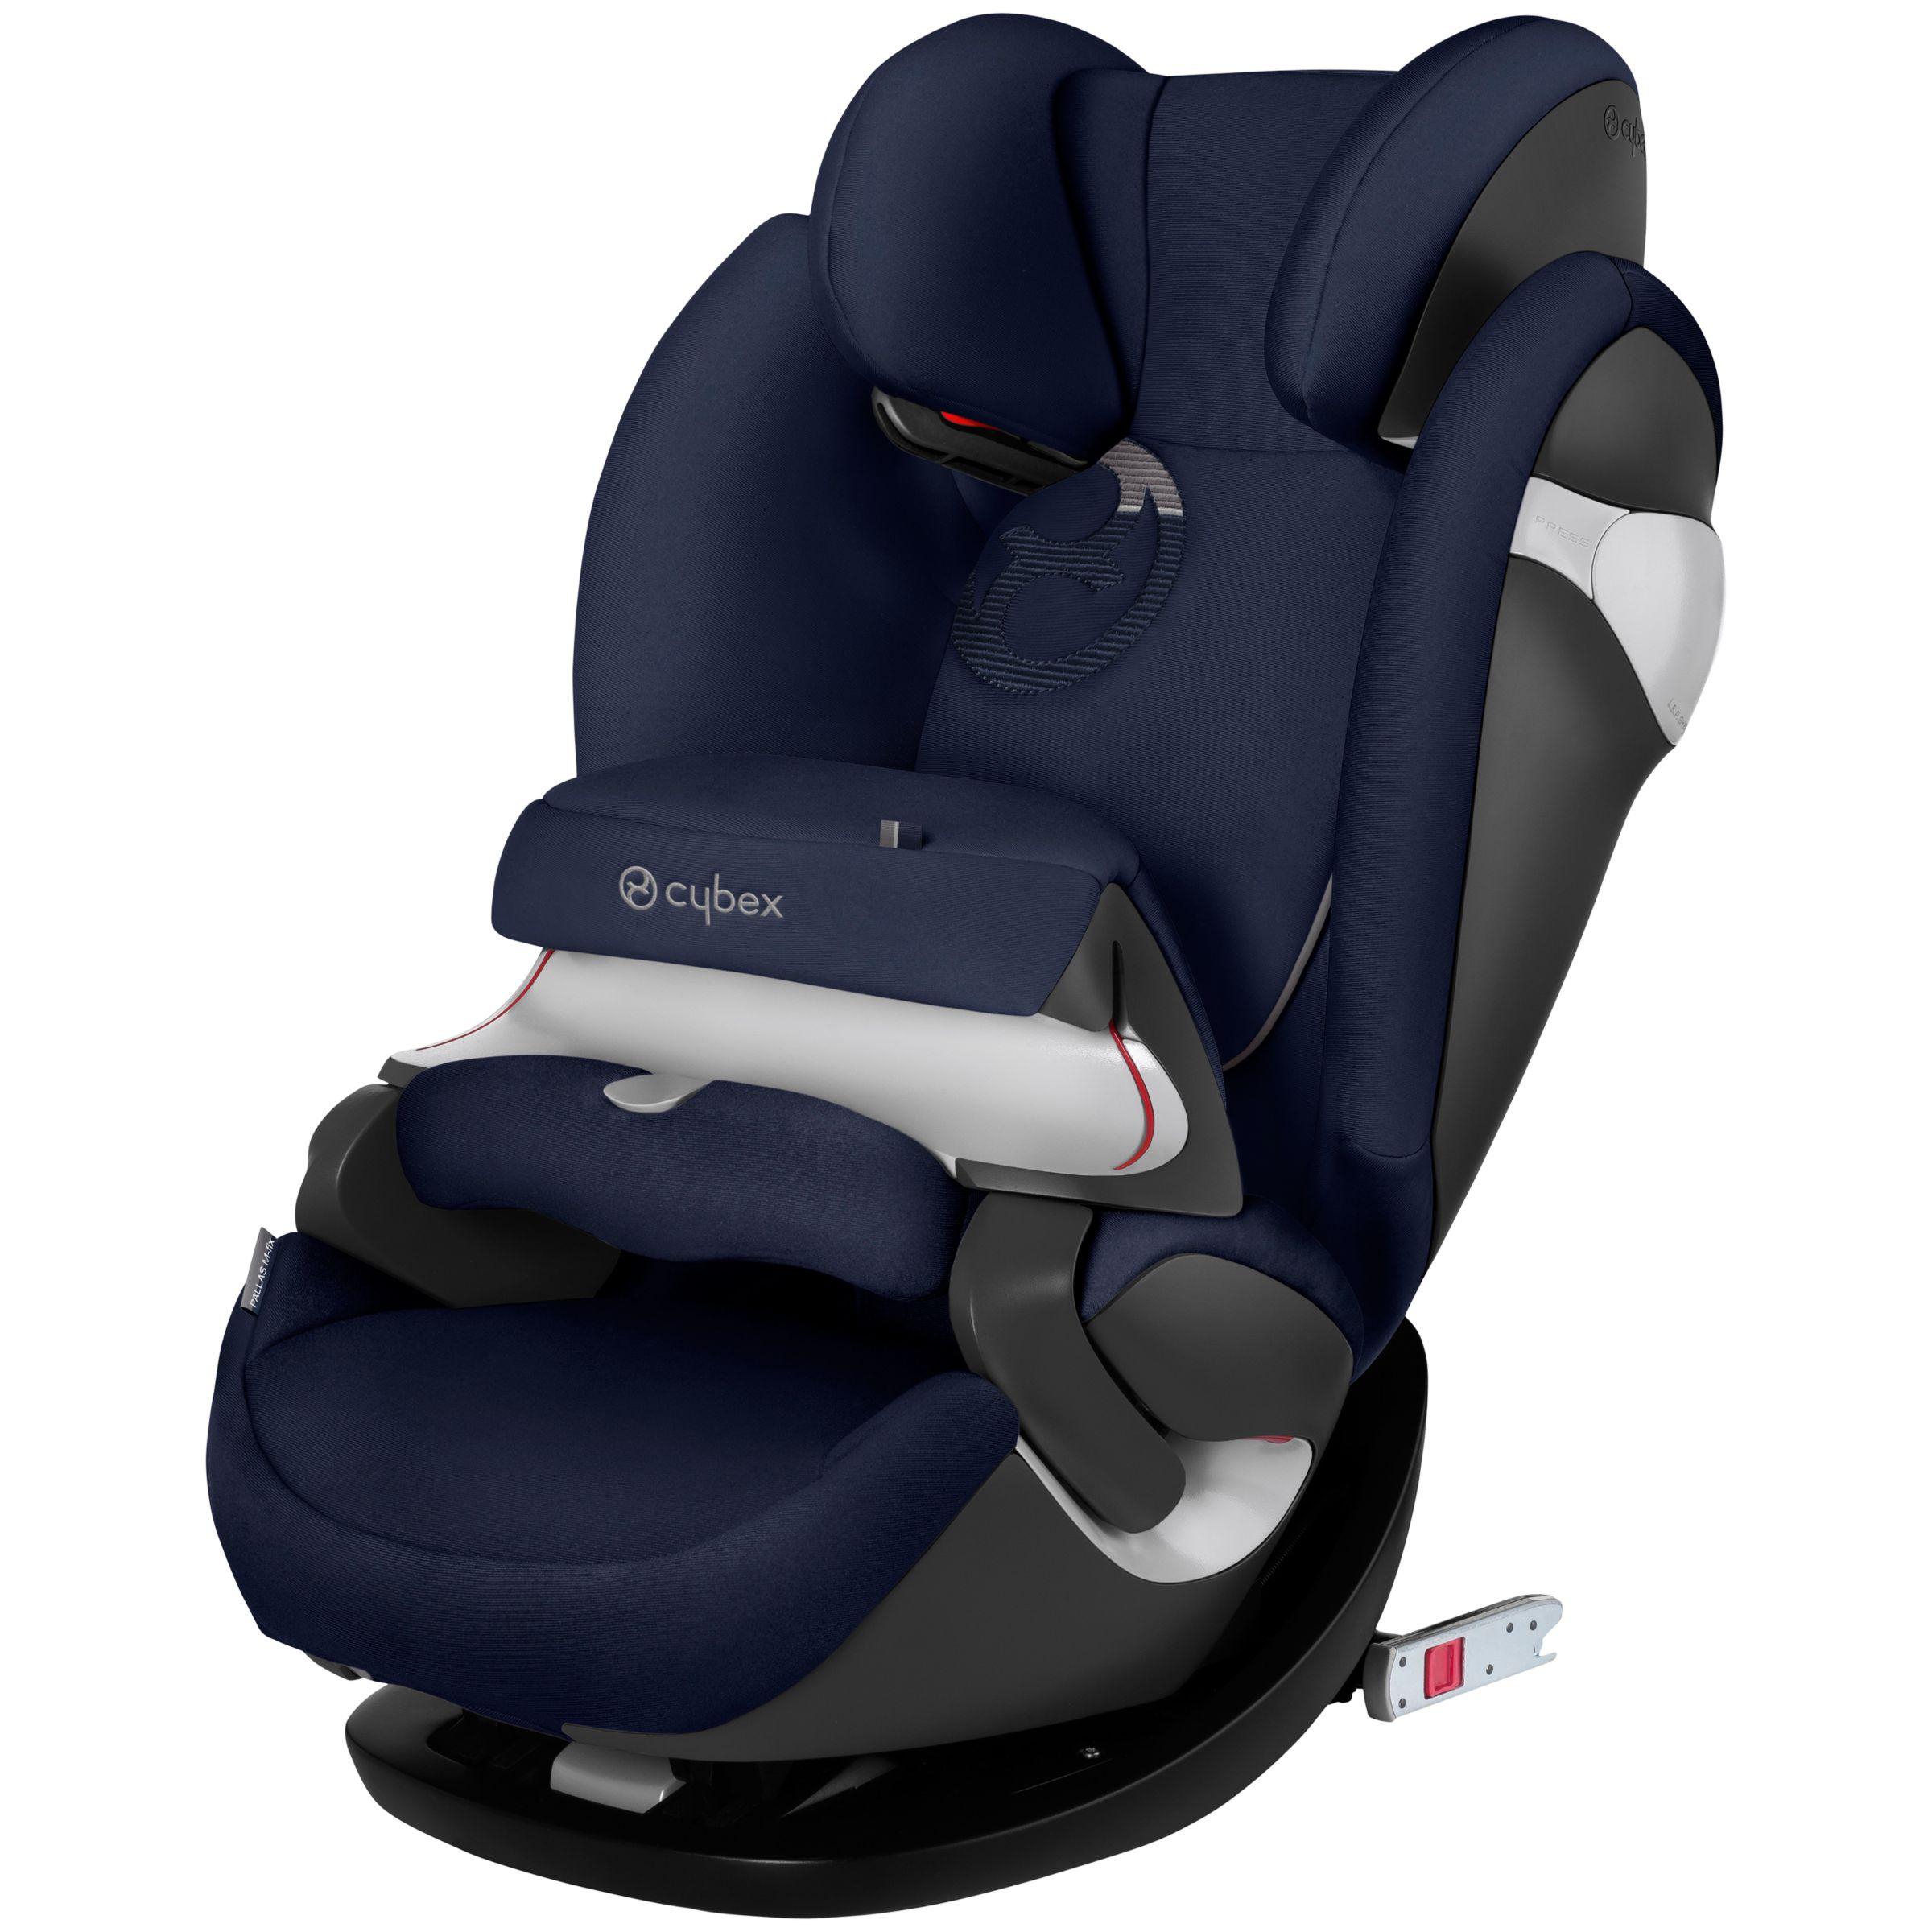 Cybex Cybex Pallas M-Fix Group 1 2 3 Car Seat, Blue